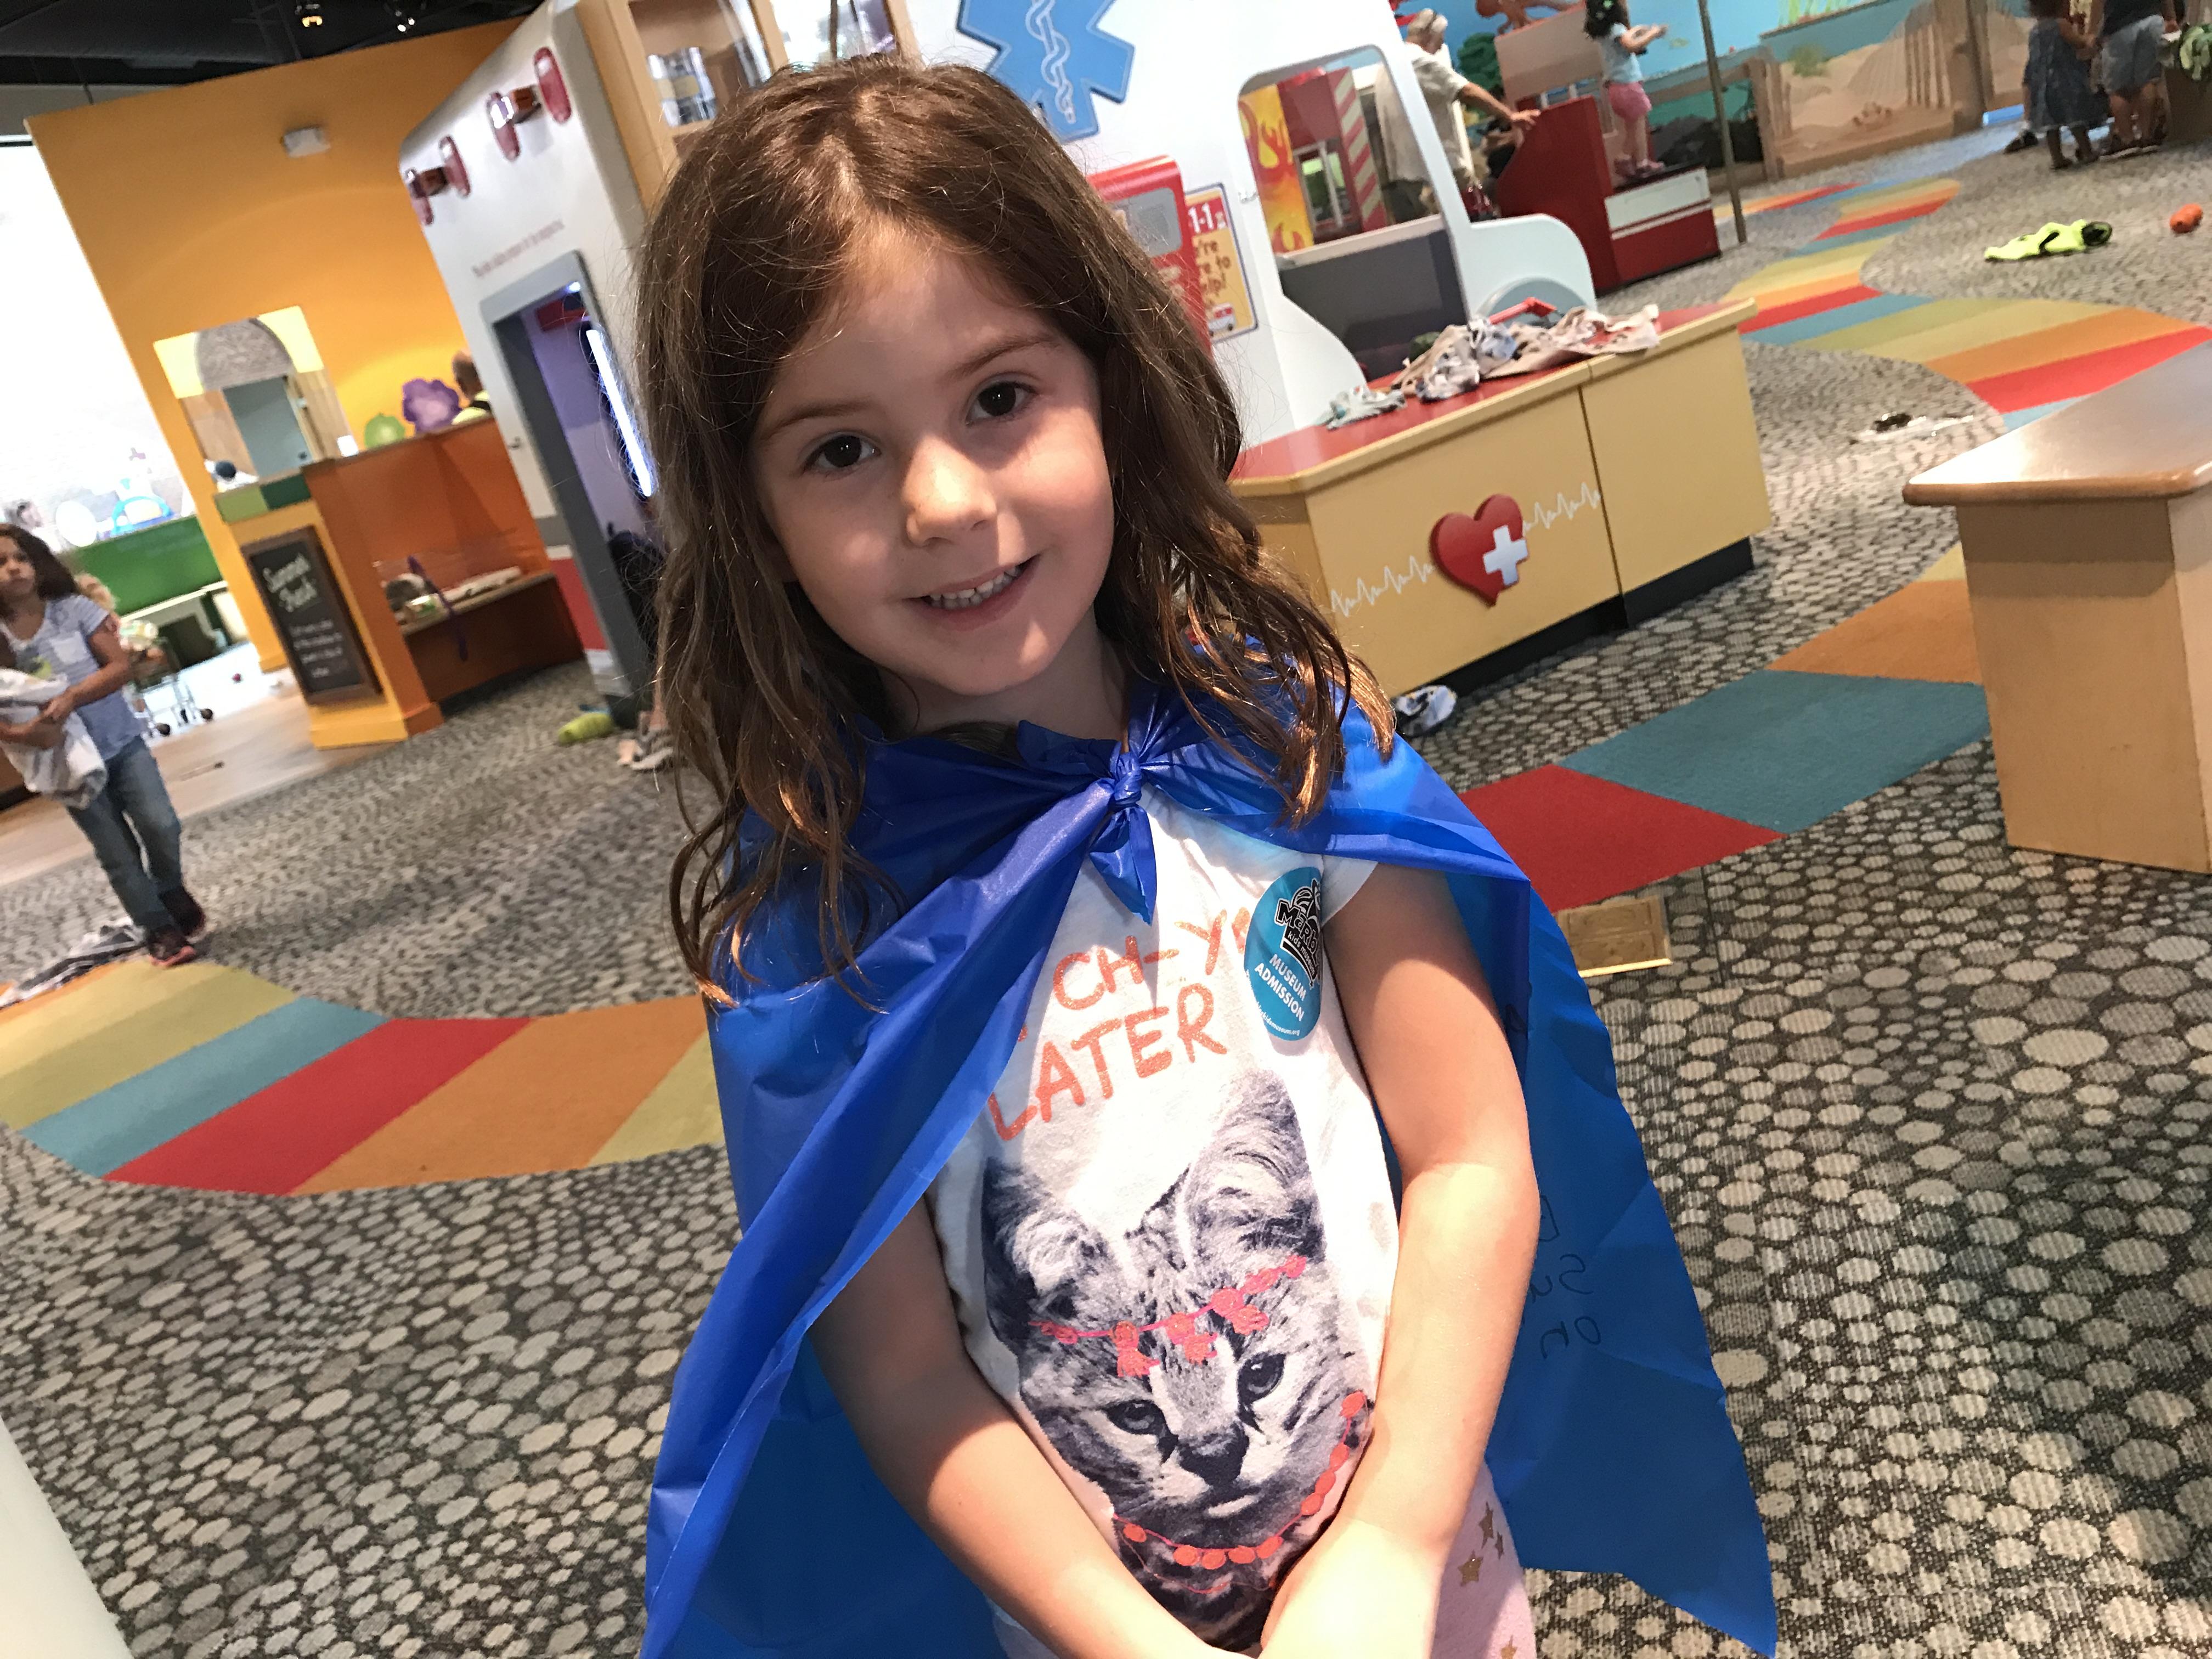 "<div class=""meta image-caption""><div class=""origin-logo origin-image none""><span>none</span></div><span class=""caption-text"">International Batman Day at Marbles Kids Museum (WTVD photo/Bob Gaughran)</span></div>"